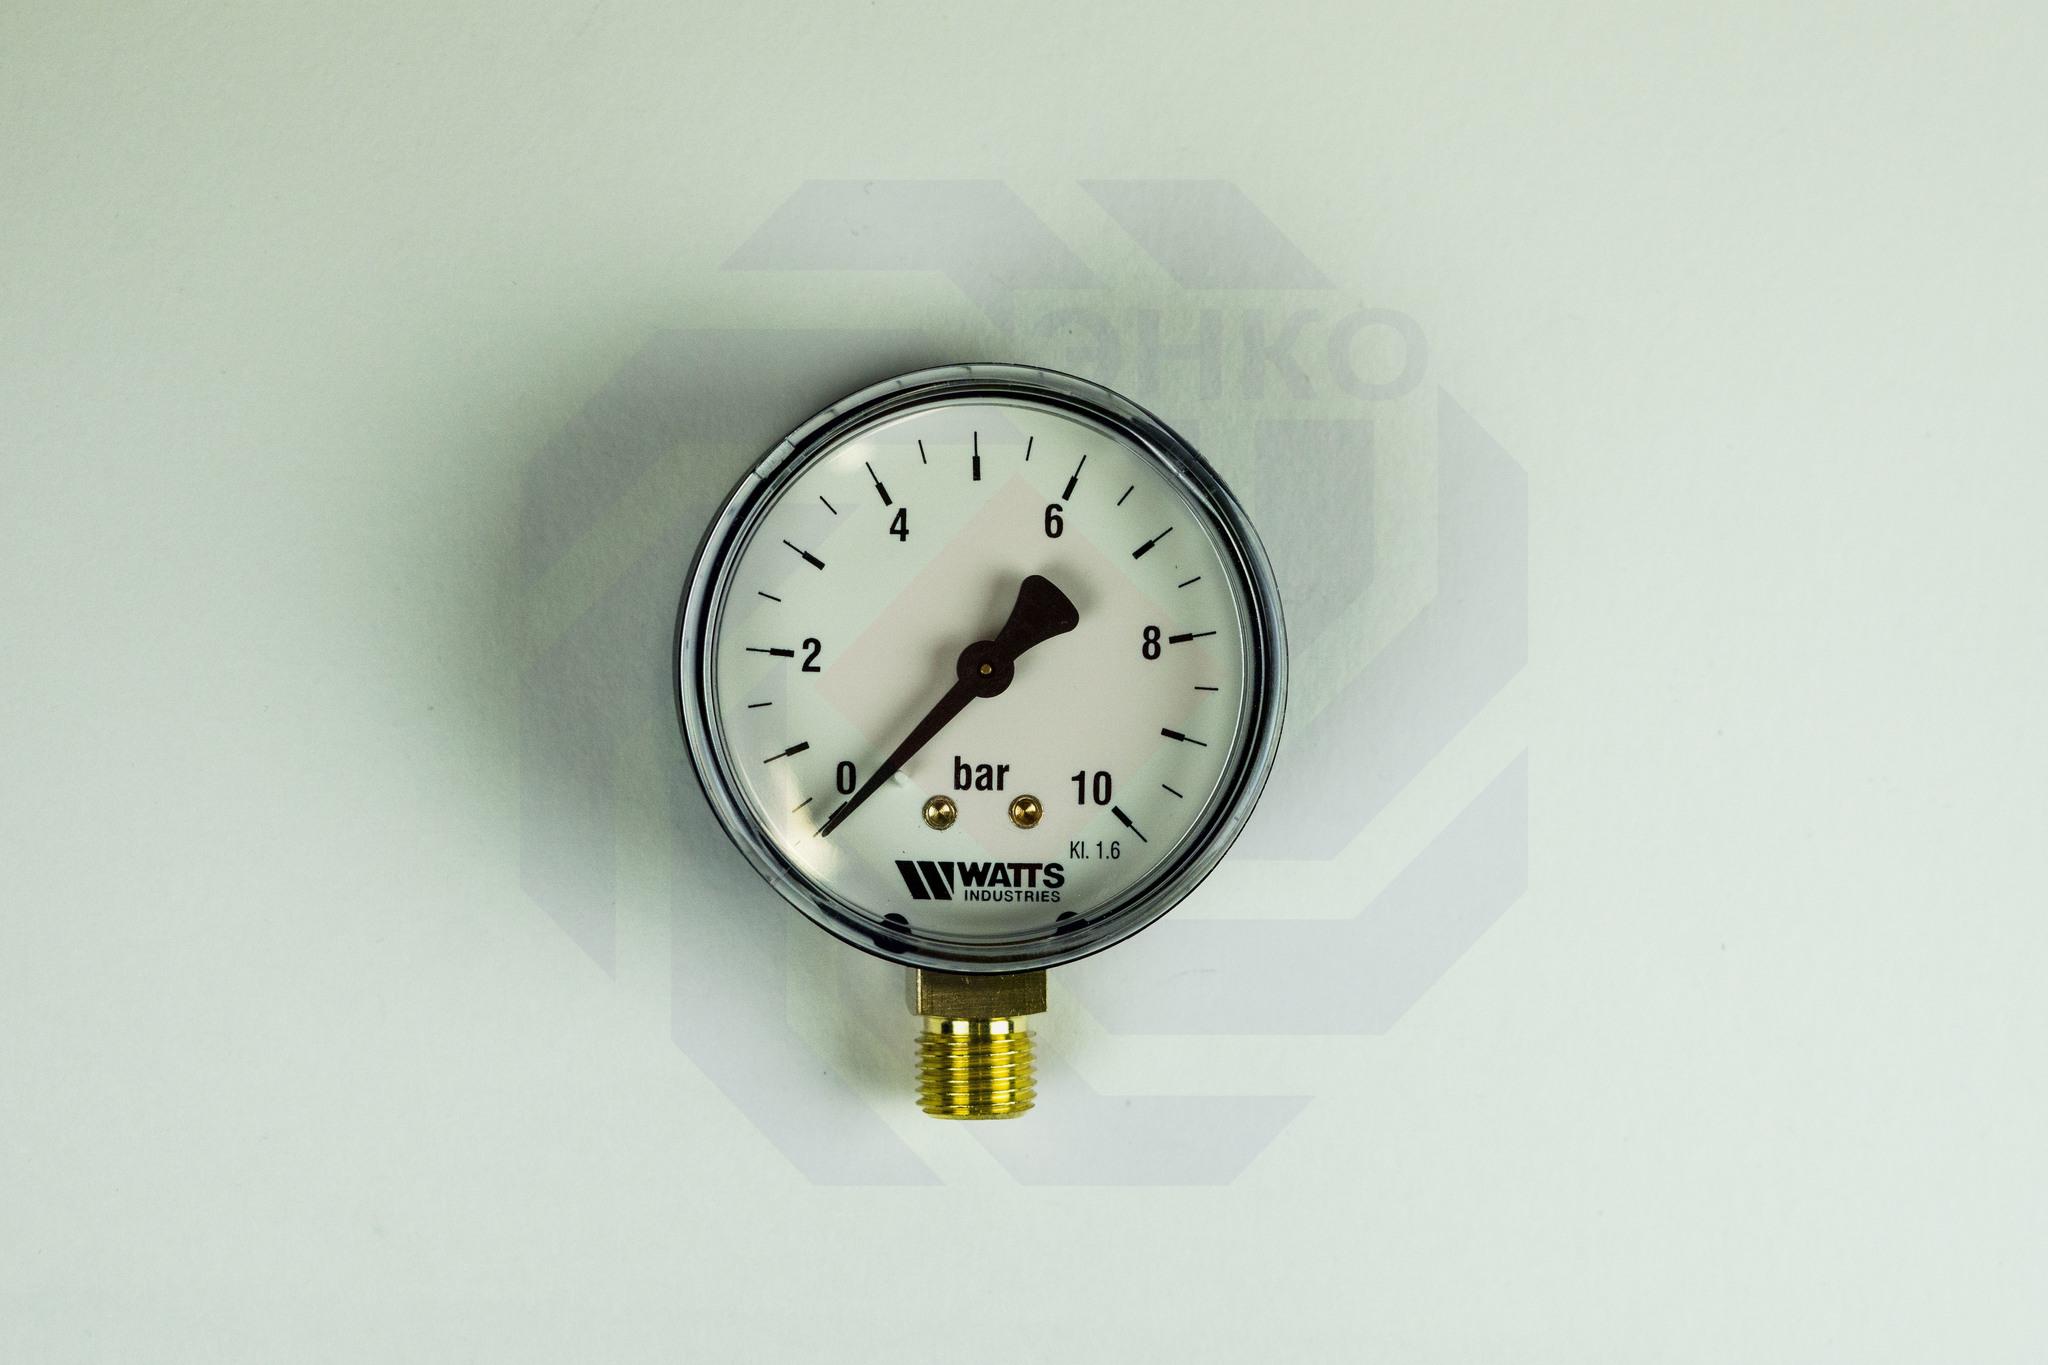 Манометр радиальный WATTS MDR 63/10 (F+R200) 0-10 бар 63 мм ¼